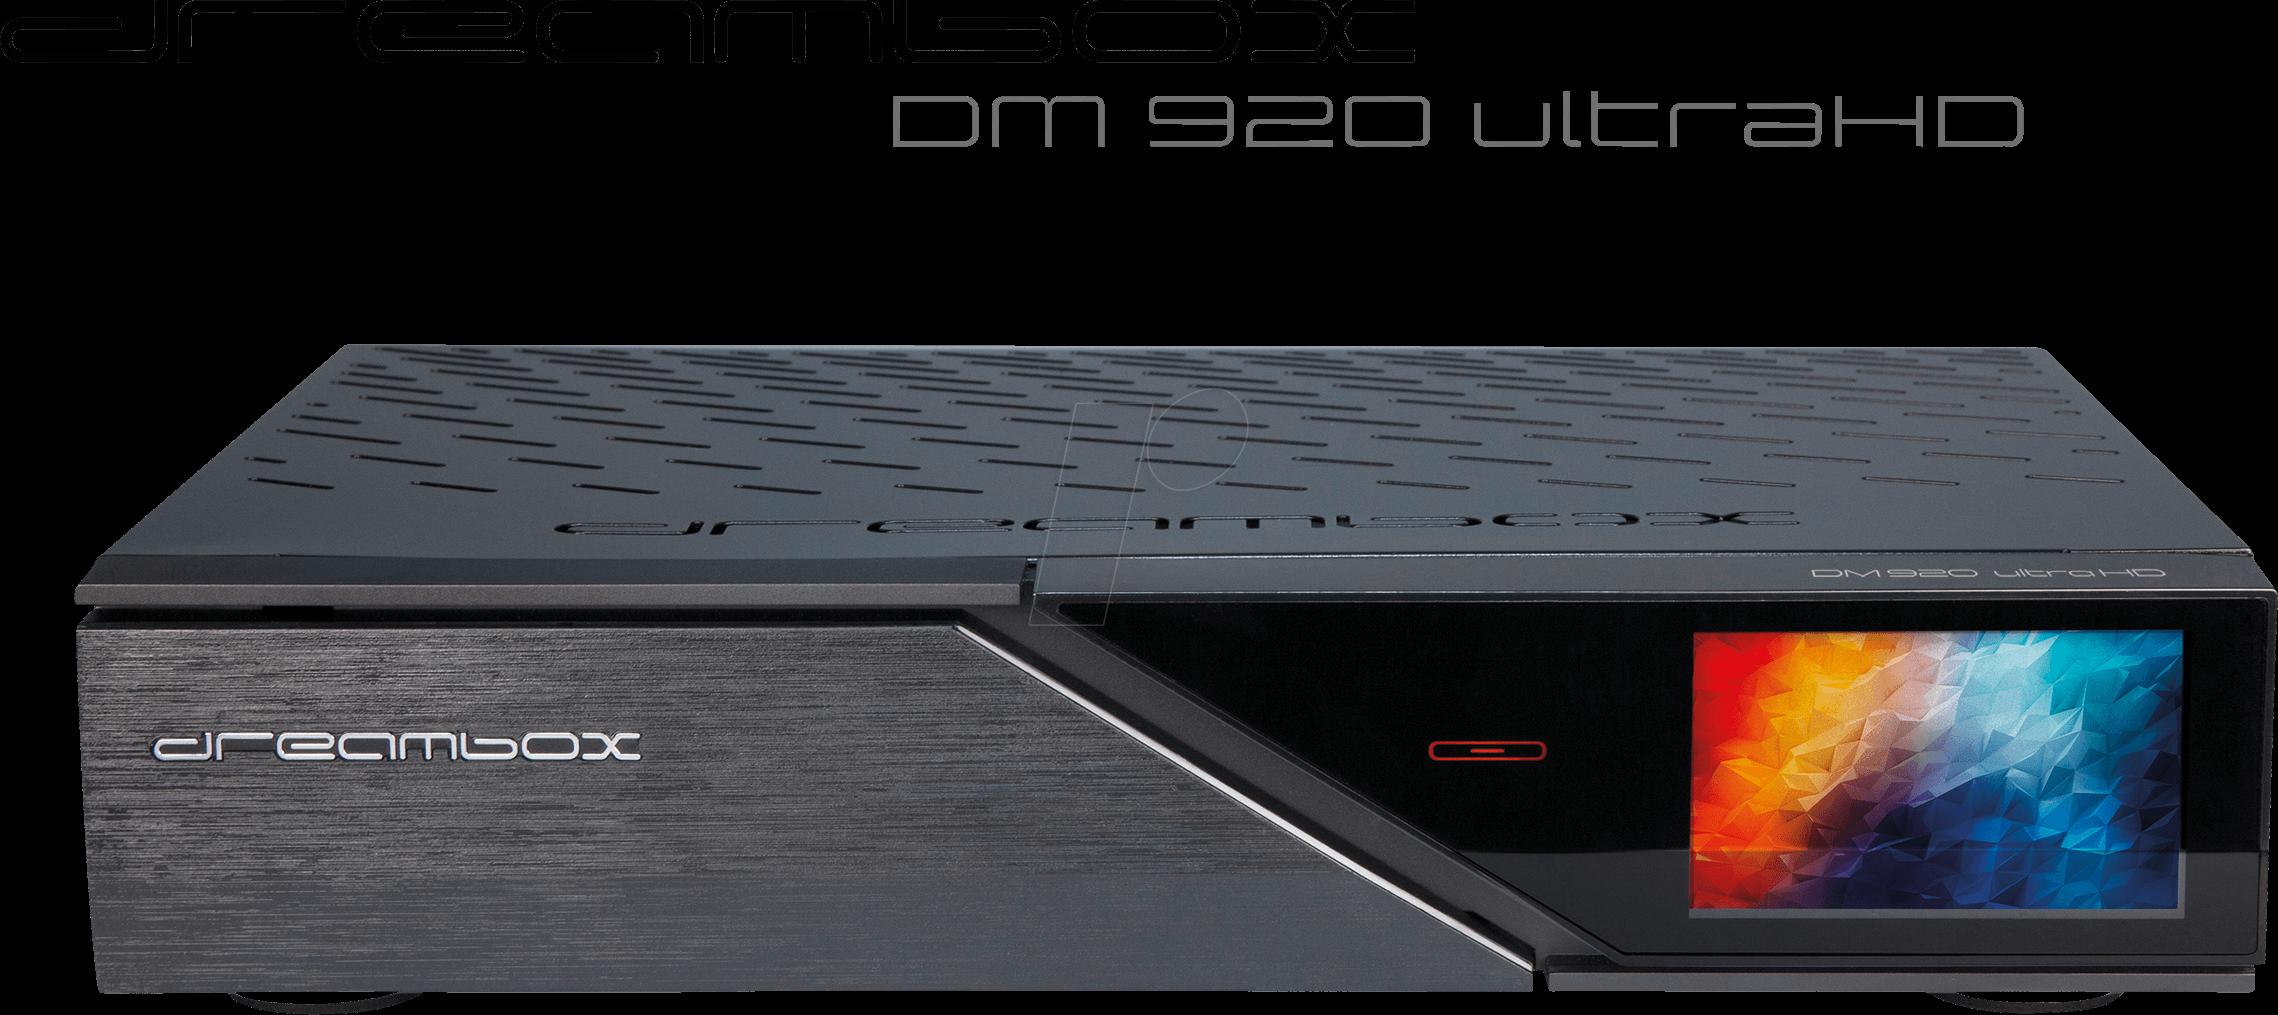 DM920UHD 2S2FBC - Receiver, SAT, 2x DVB-S2 FBC, UHD